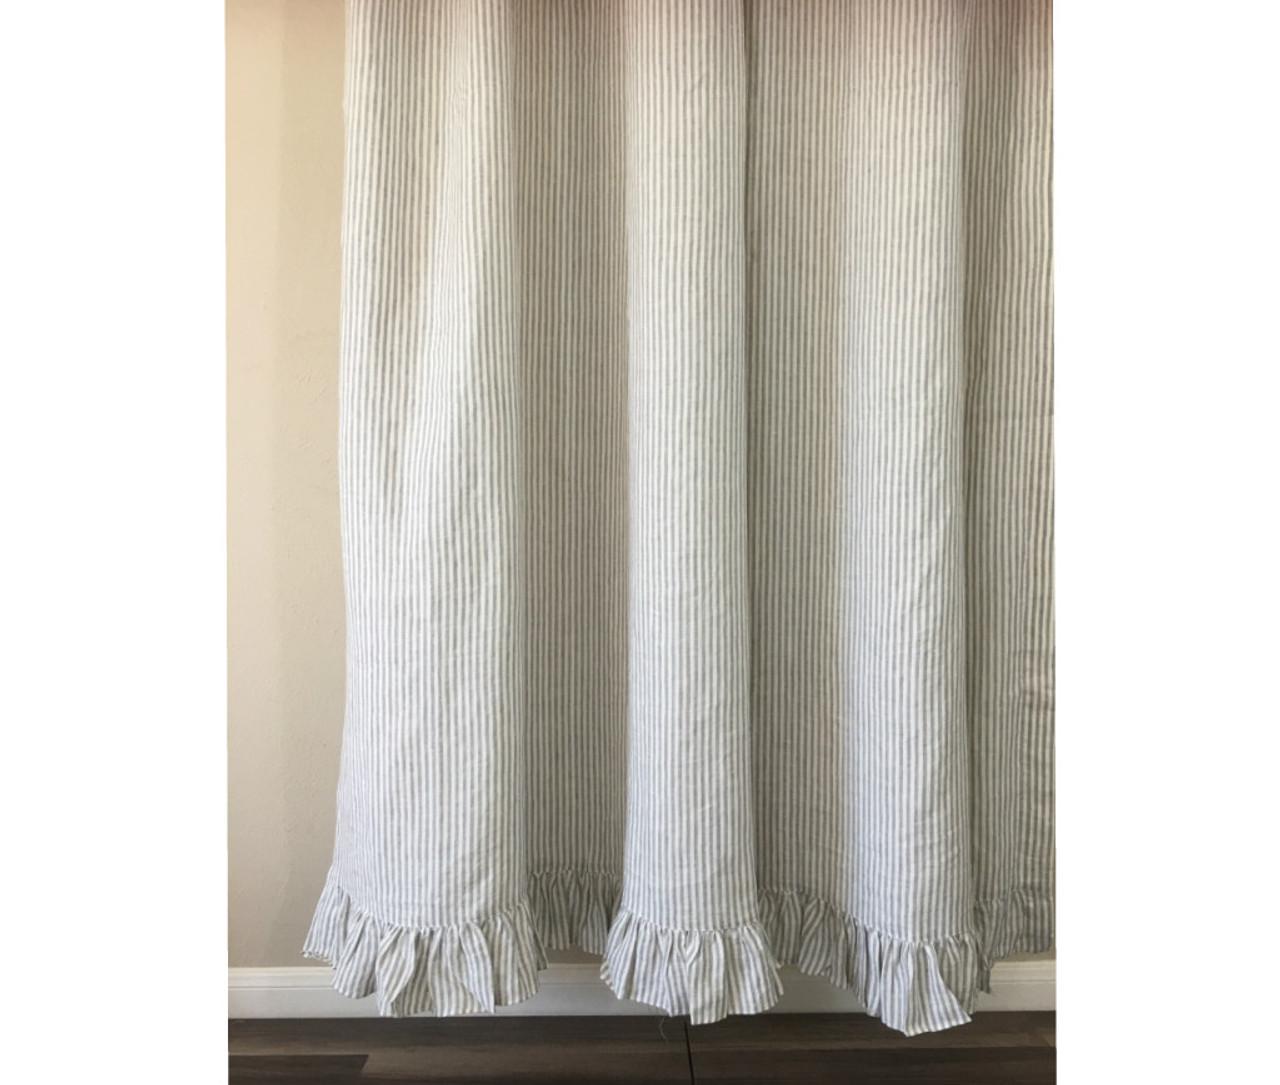 Grey Stripe Linen Shower Curtain Features Ruffle Hem Mildew Free 72x72 72x85 72x94 Custom Curtains Bathroom Curtain Bathroom Decor